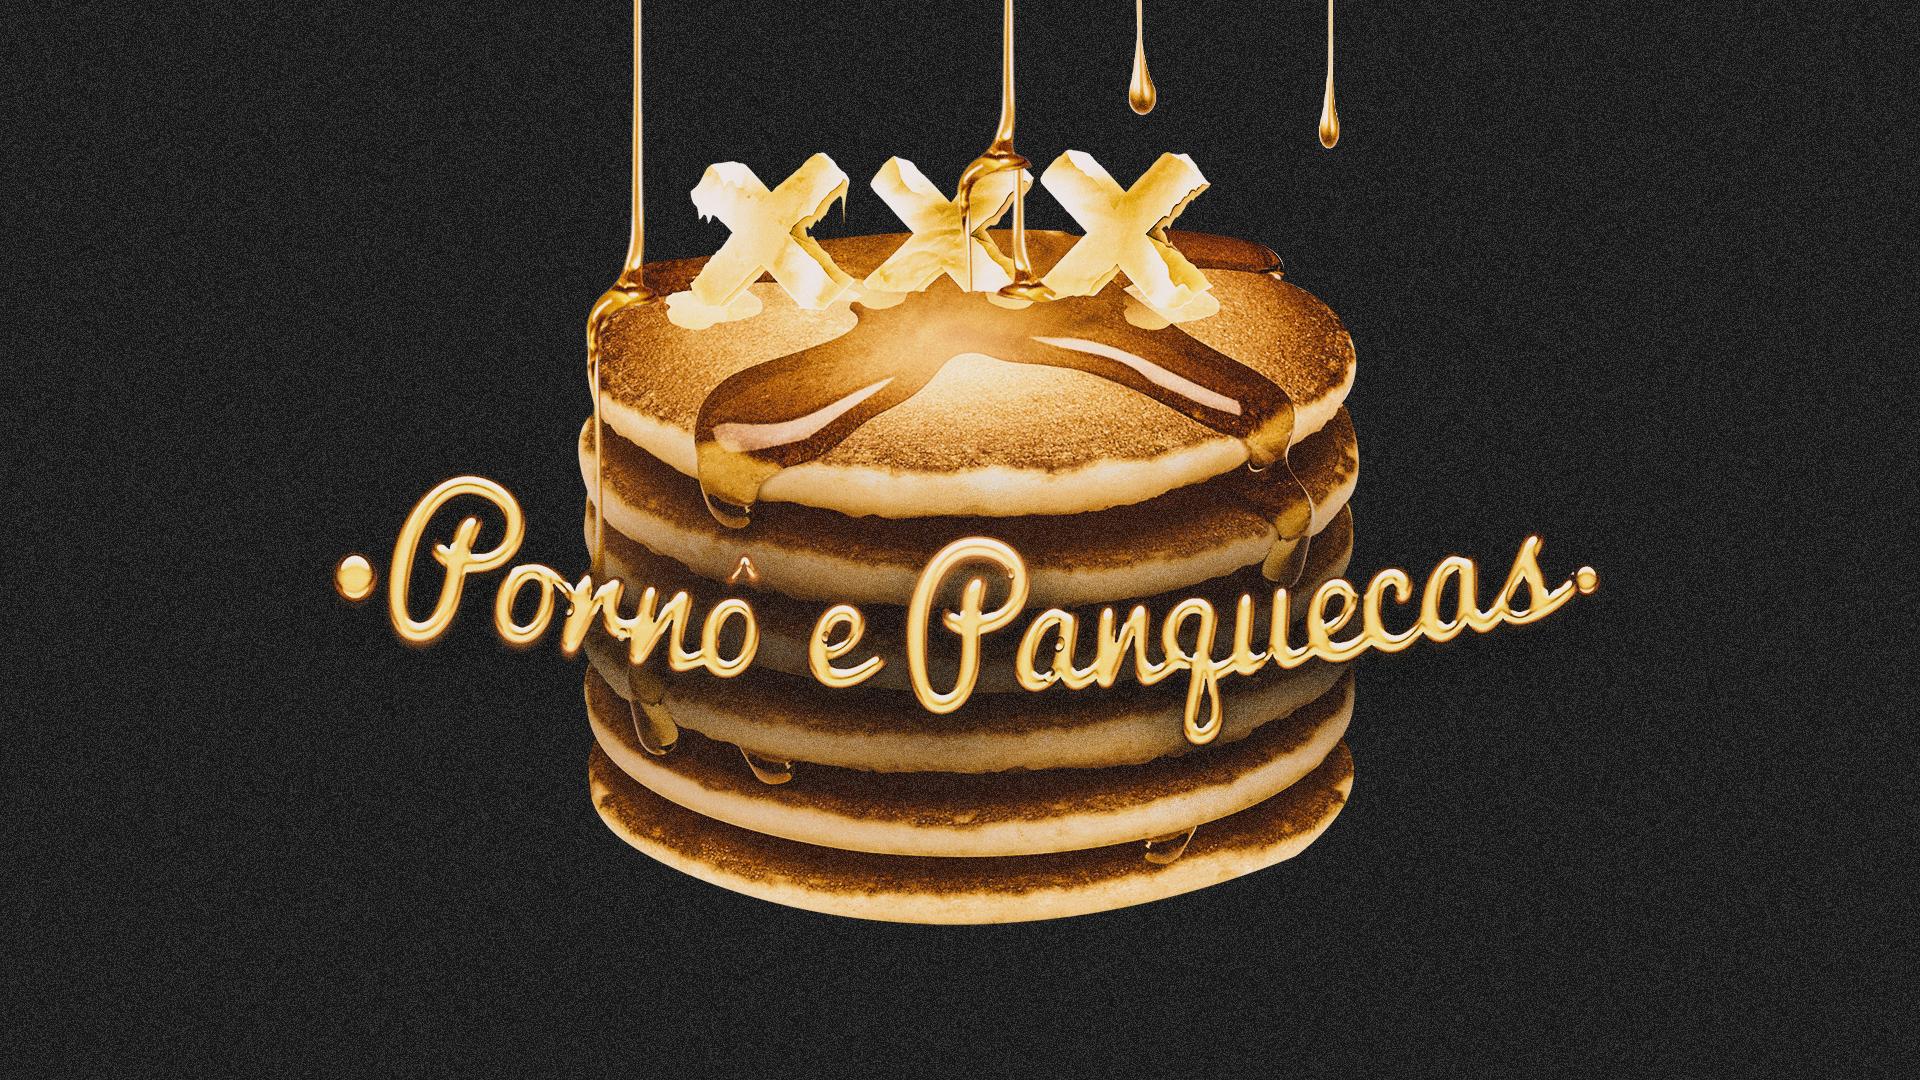 wide-Panquecas-1.jpg